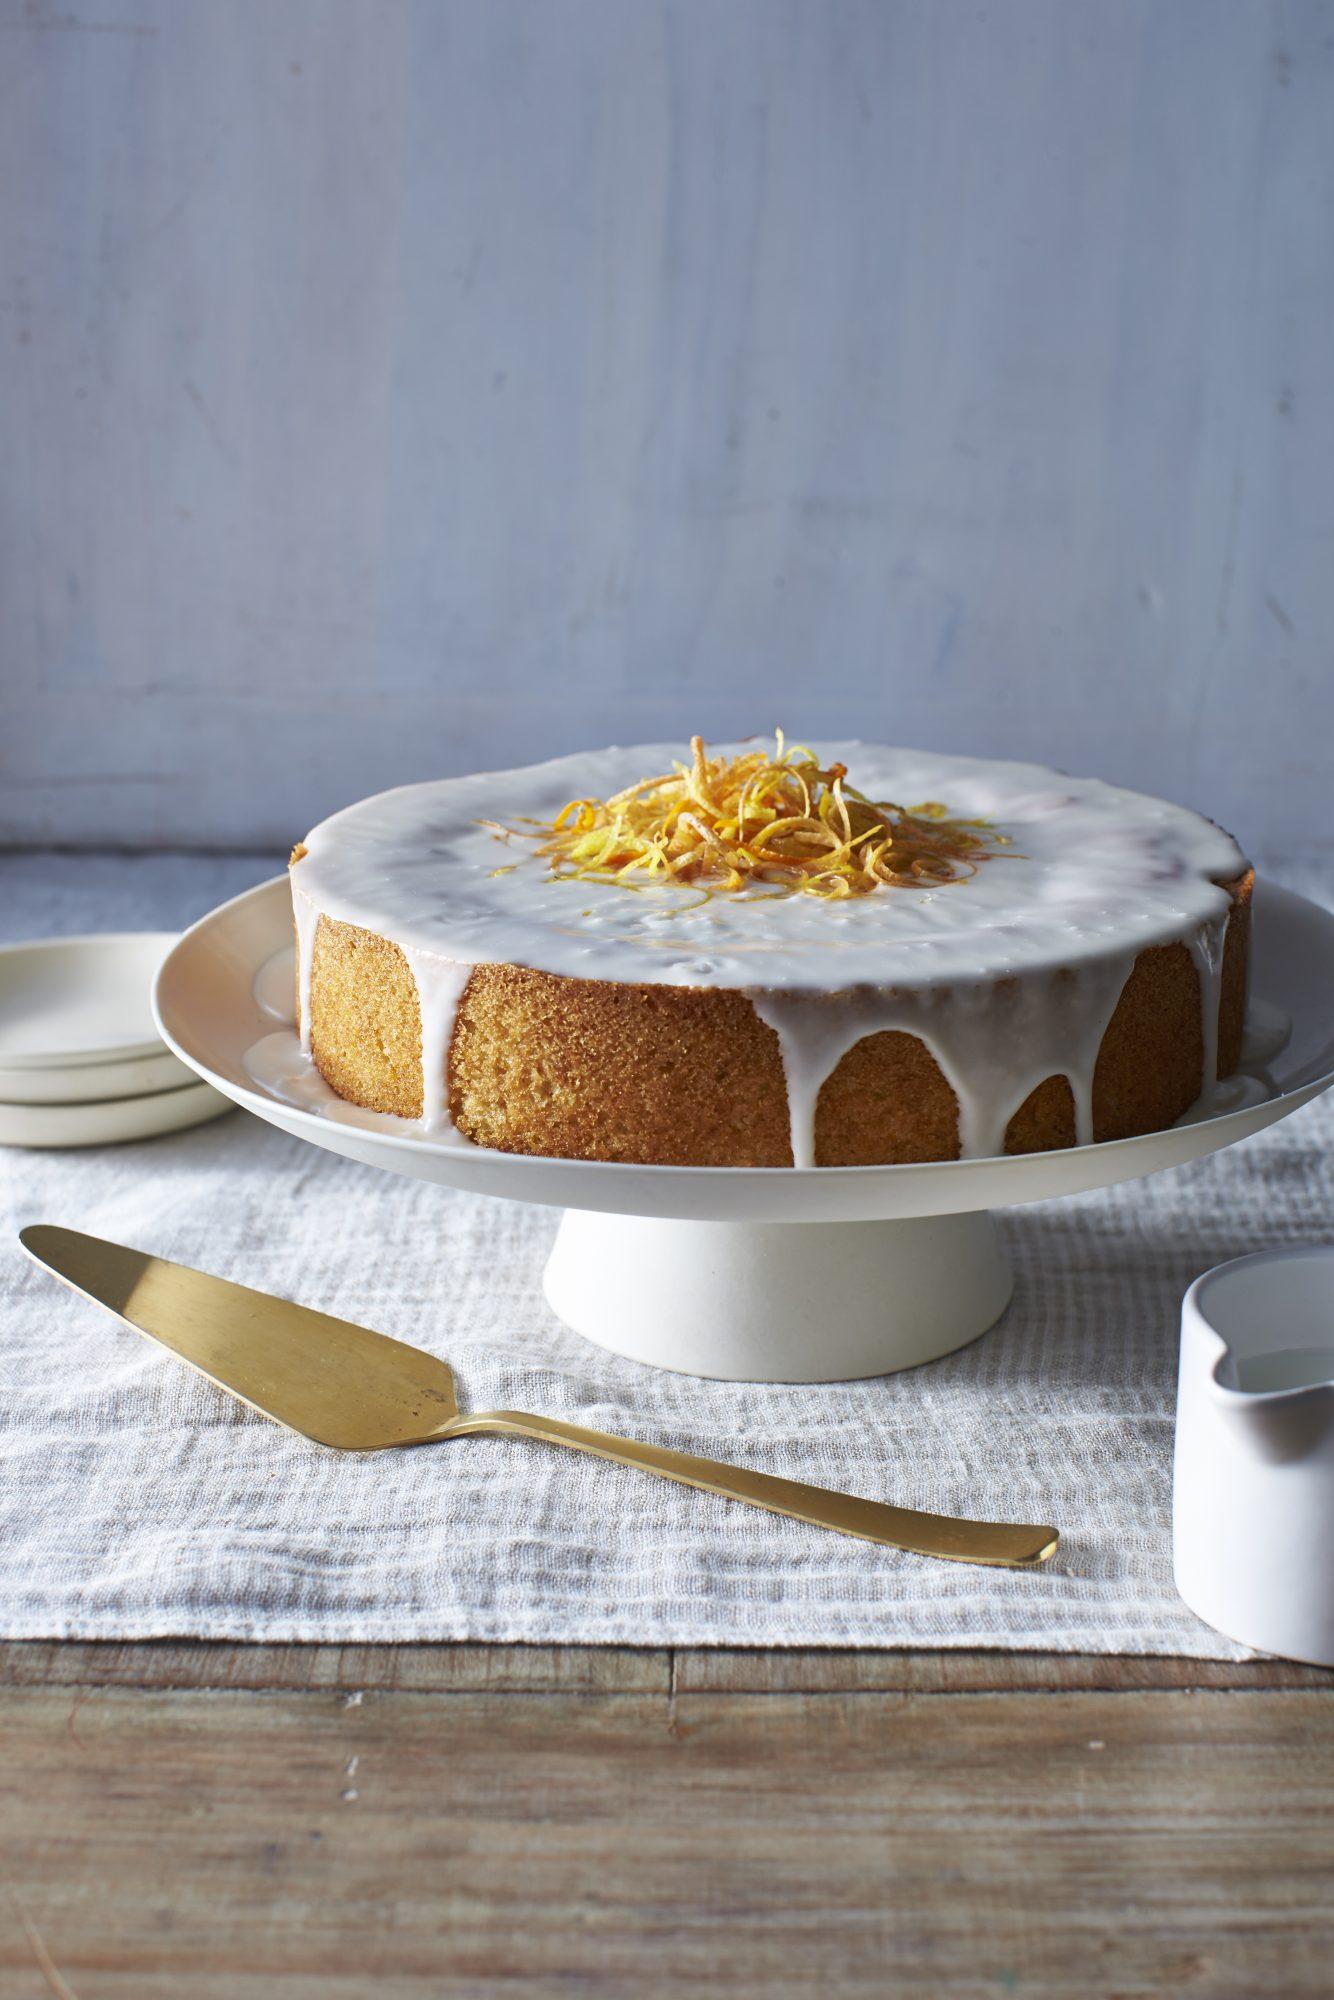 mr-orange-olive-oil-cake-image